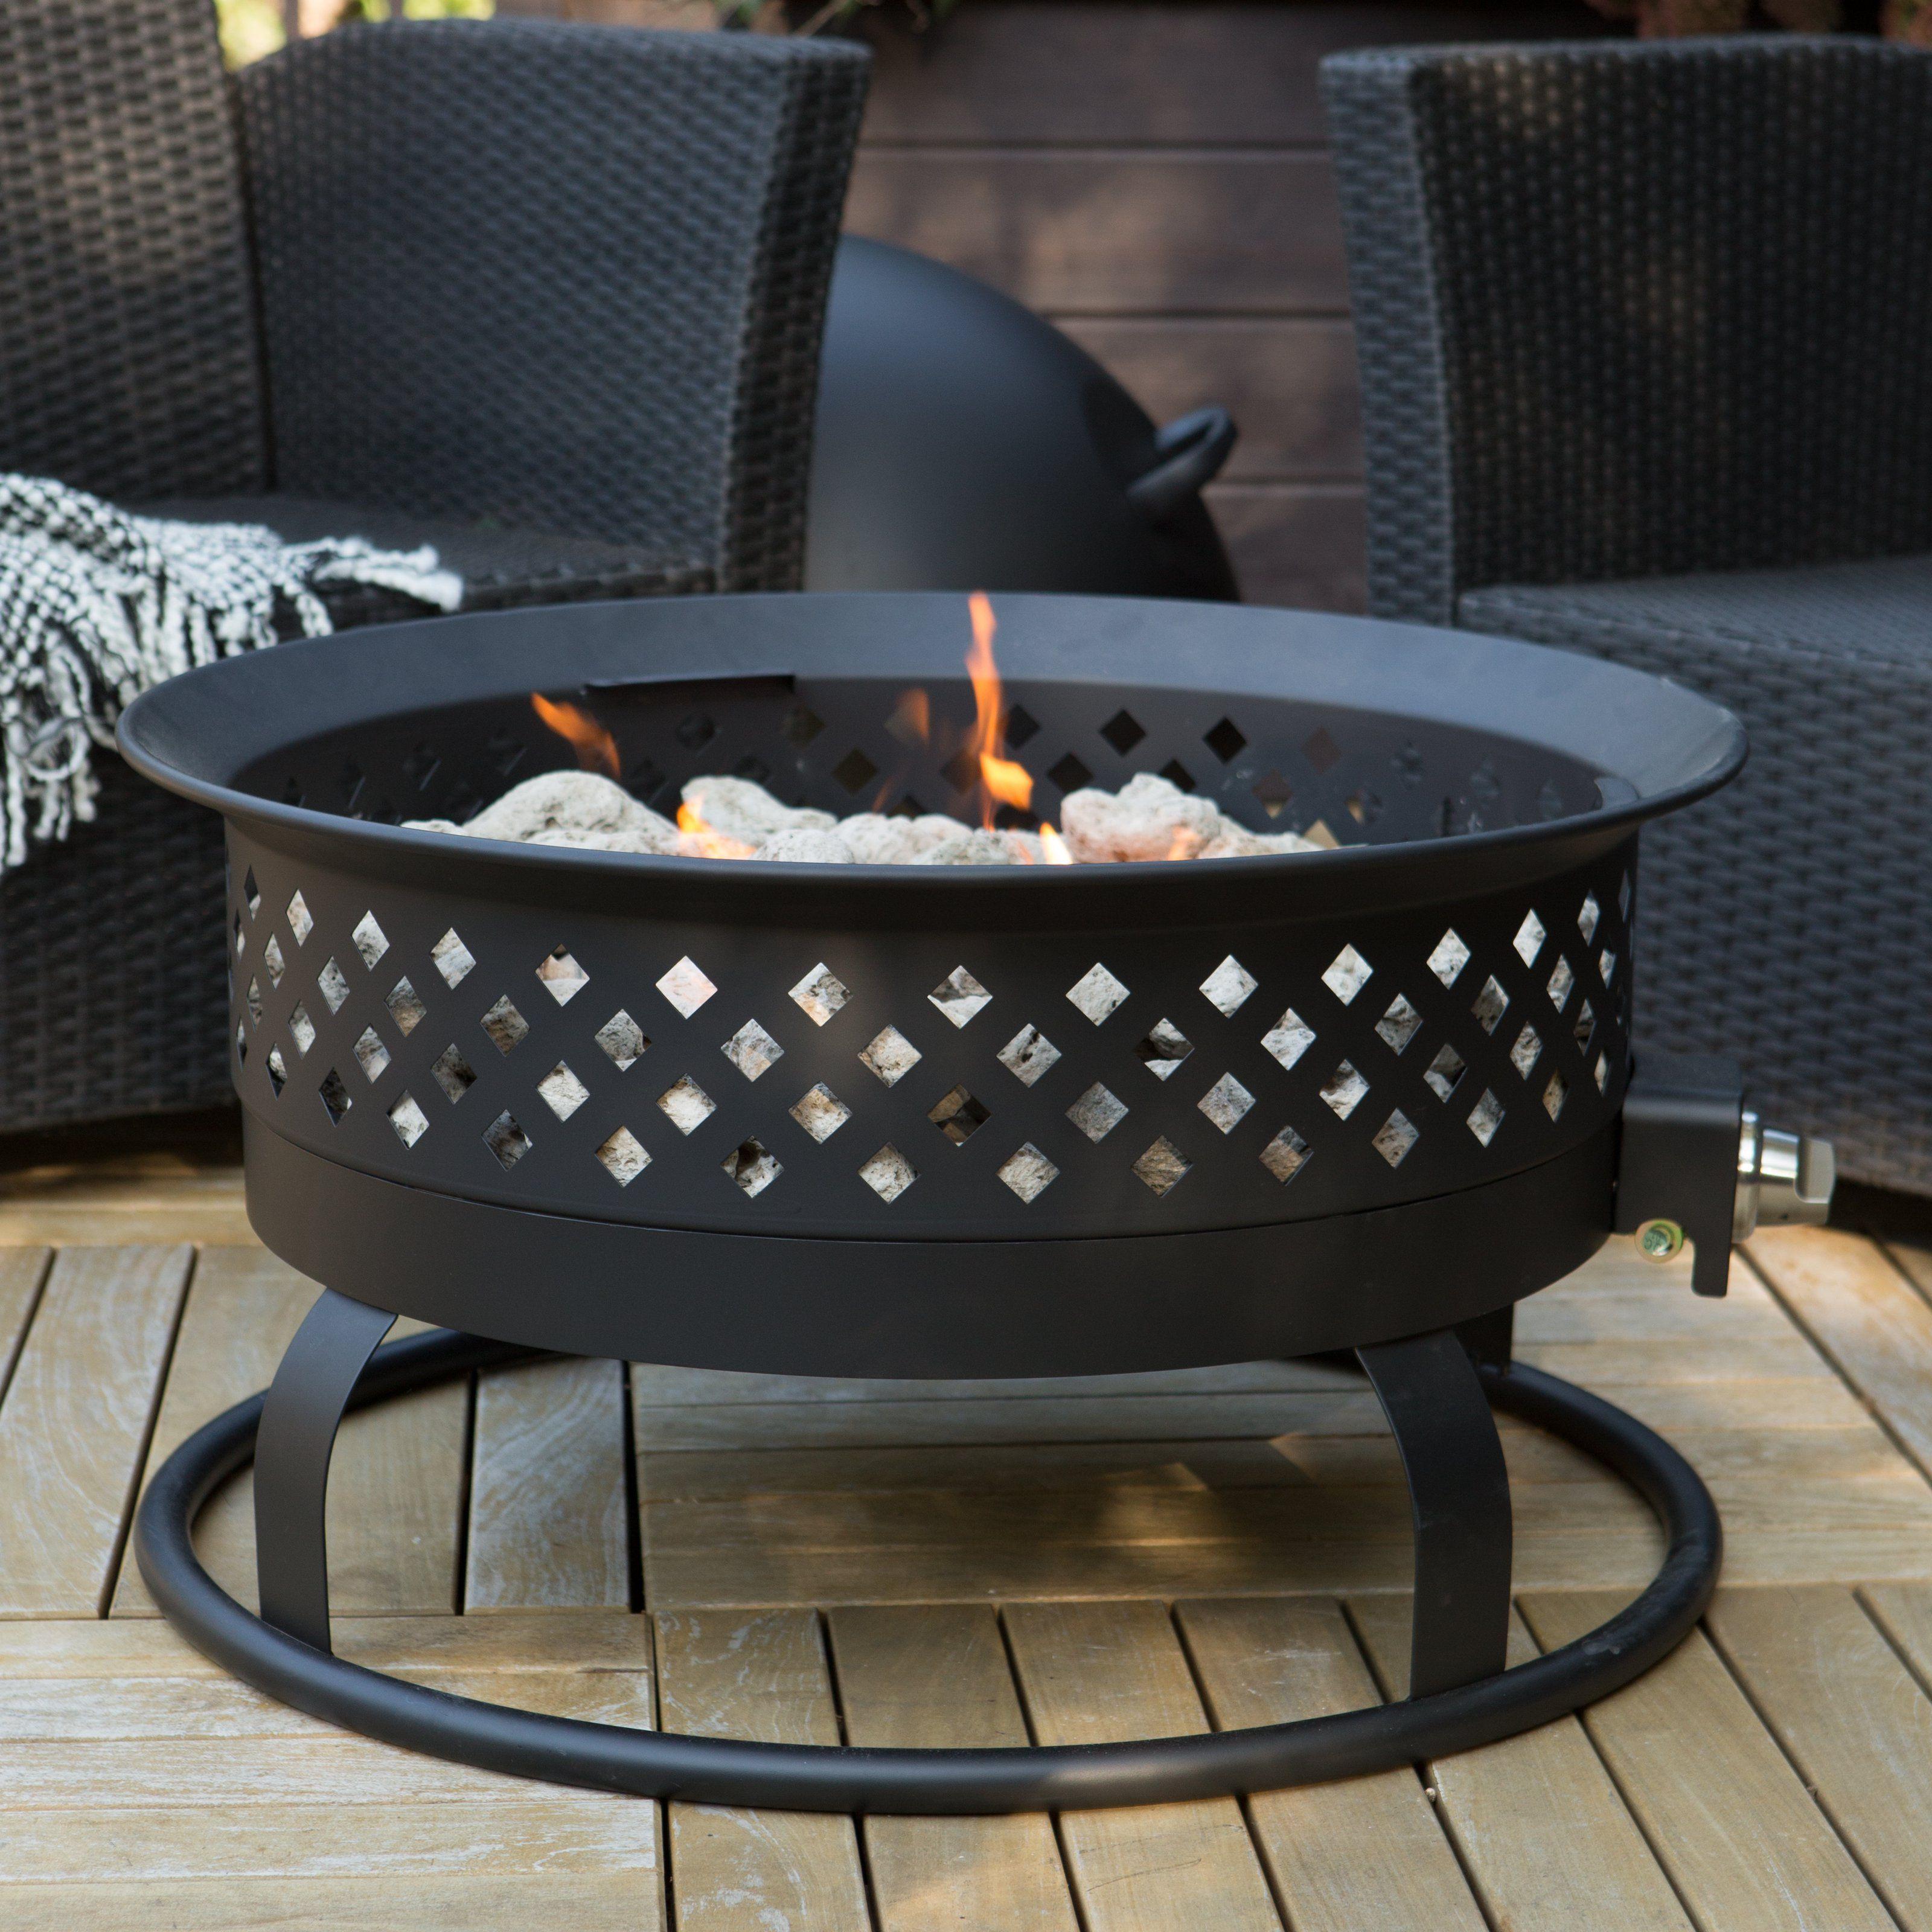 Bond 28 In Portable Round Propane 55 000 Btu Campfire Fire Pit